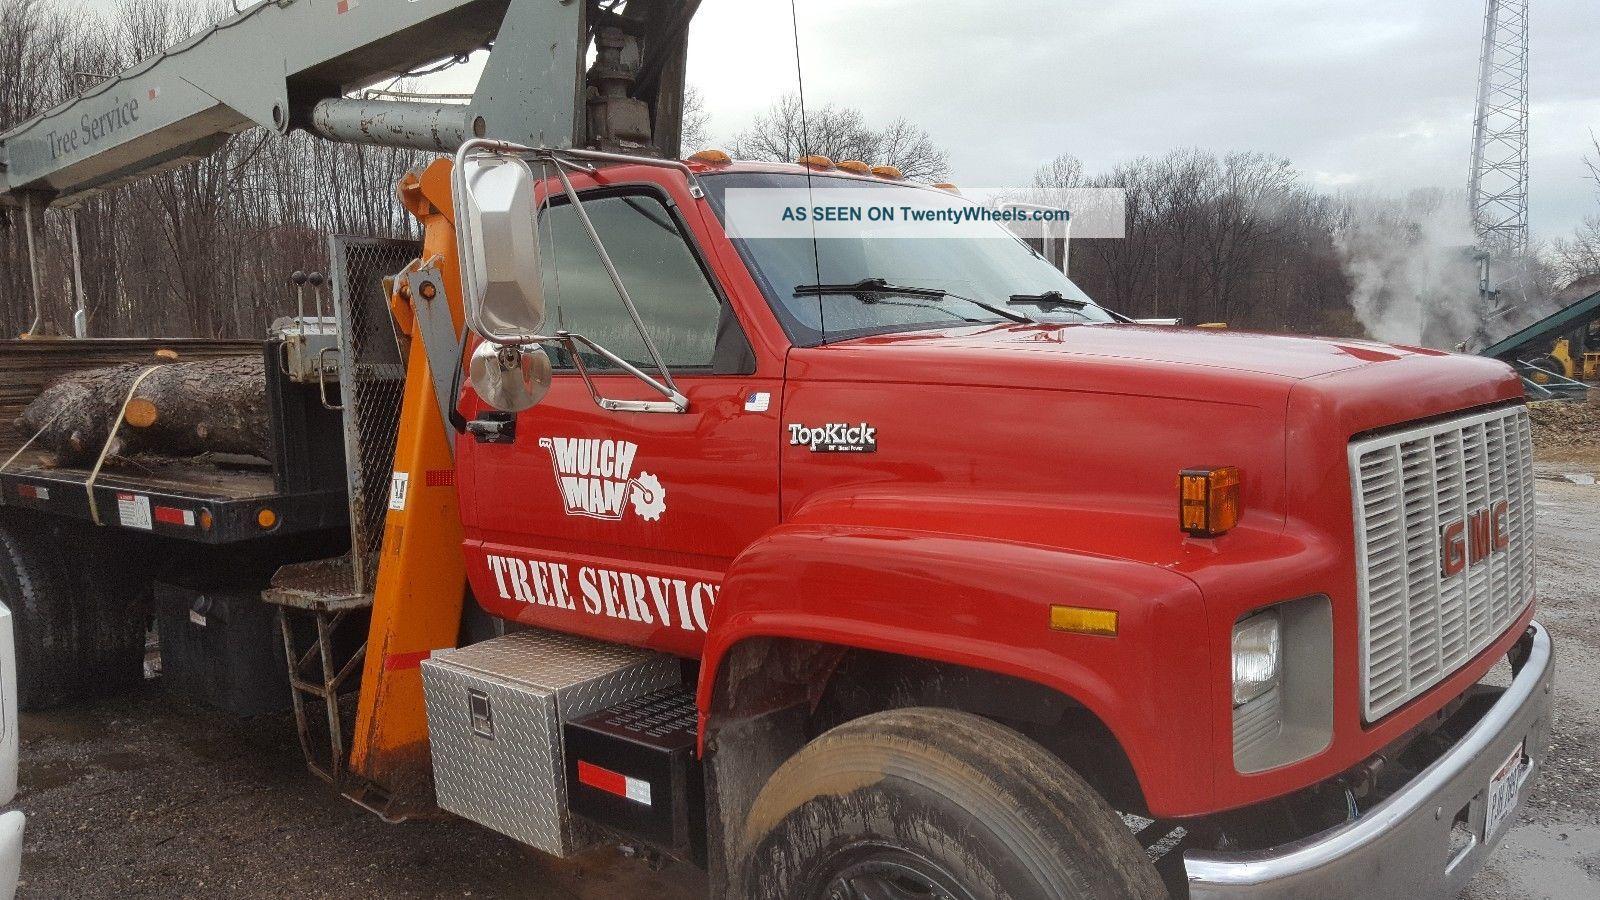 1990 Gmc Topkick 14 Ton Crane Boom Truck Boomtruck,  Jlg Cranes photo